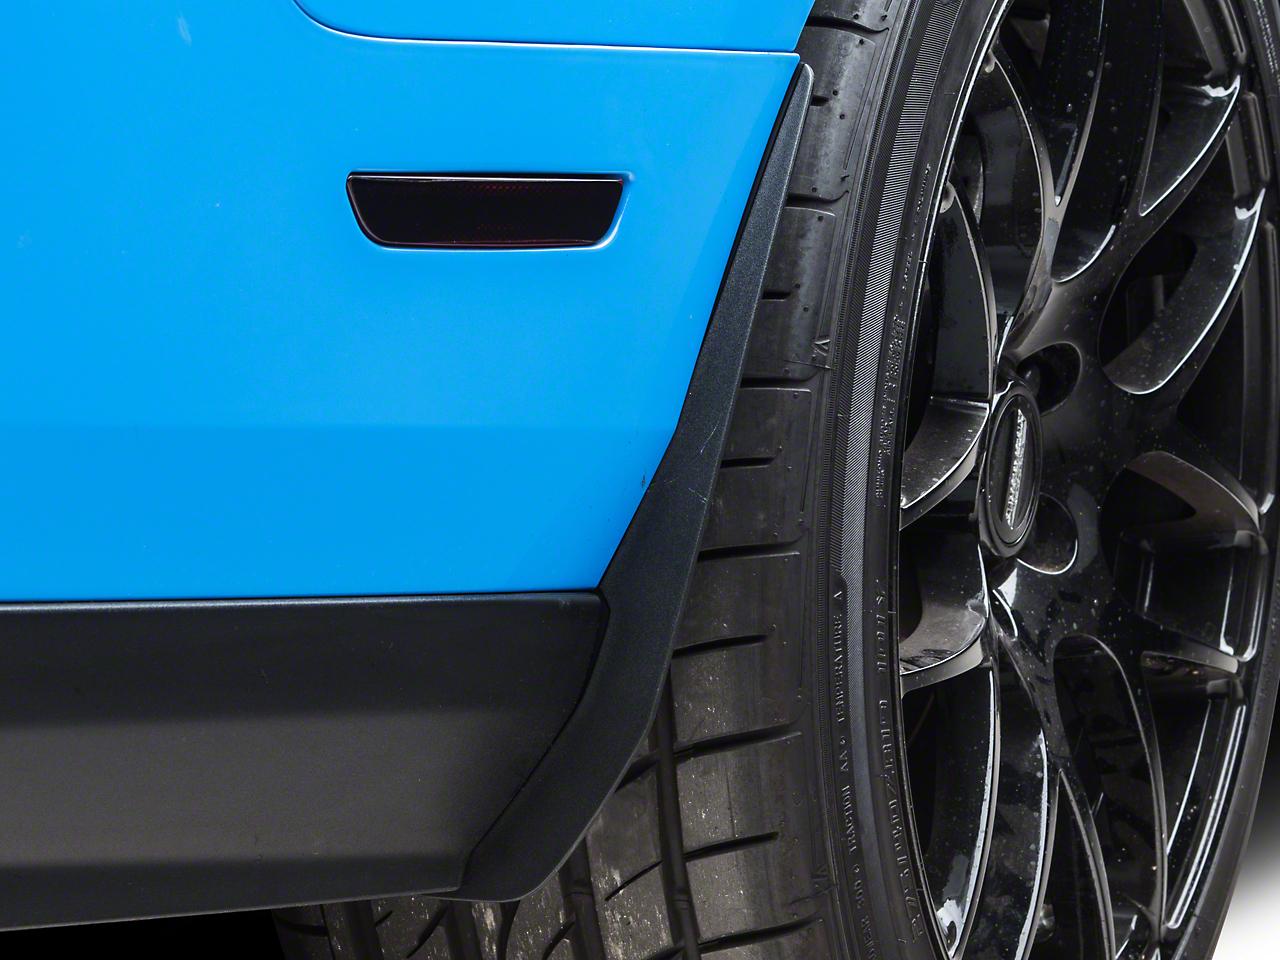 Ford GT500 Rear Splash Guard - Passenger Side (10-14 All)